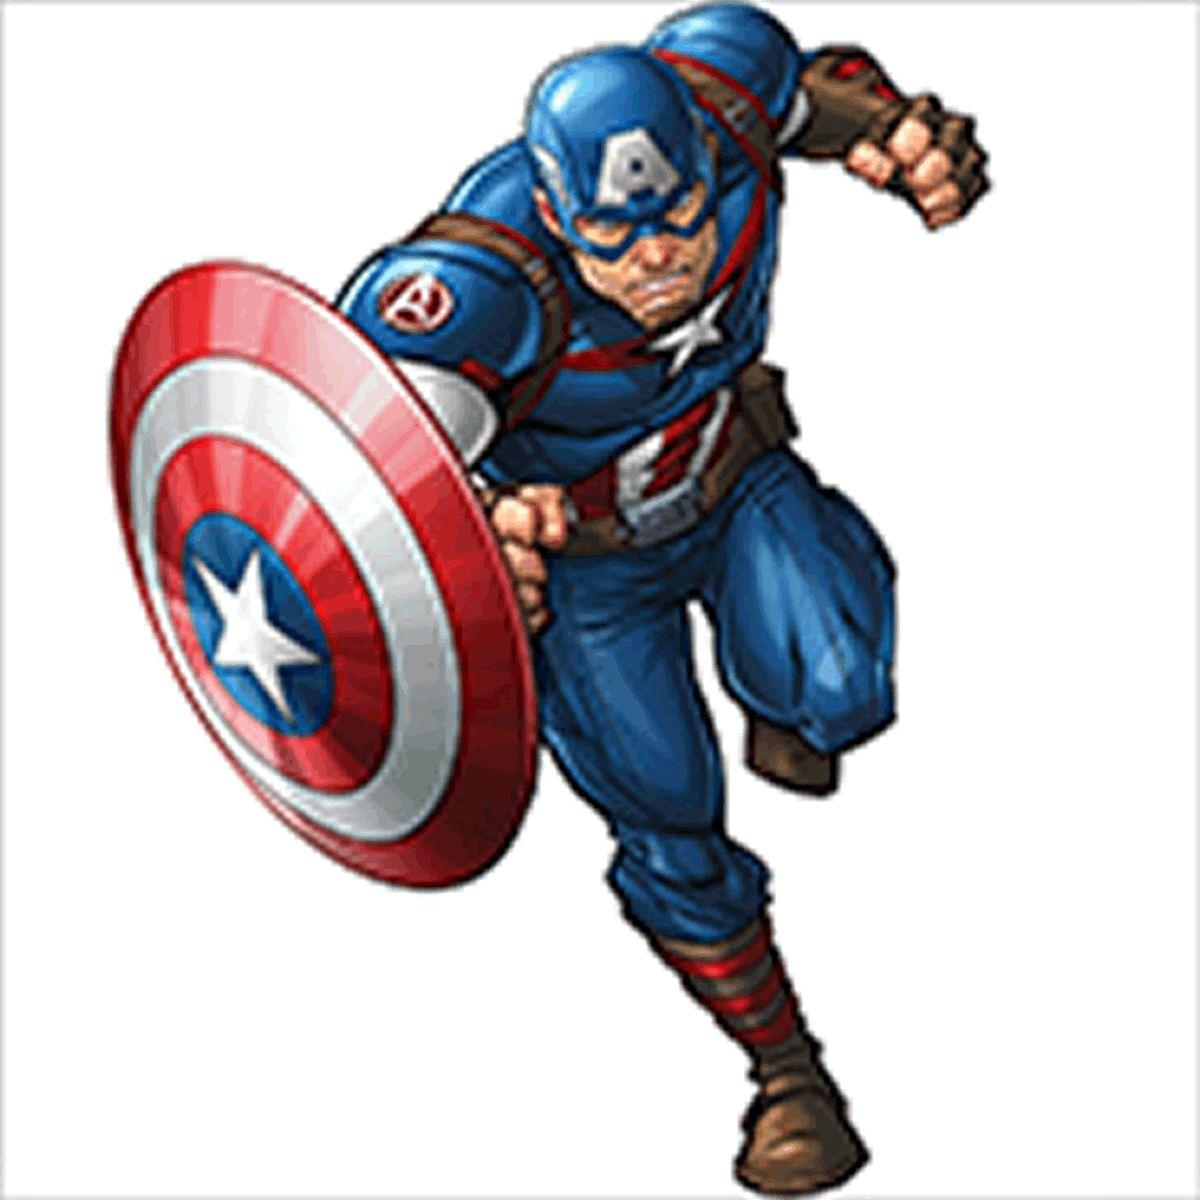 49992c1f005a43 Avengers Kids Character Shirts & Clothing - Macy's